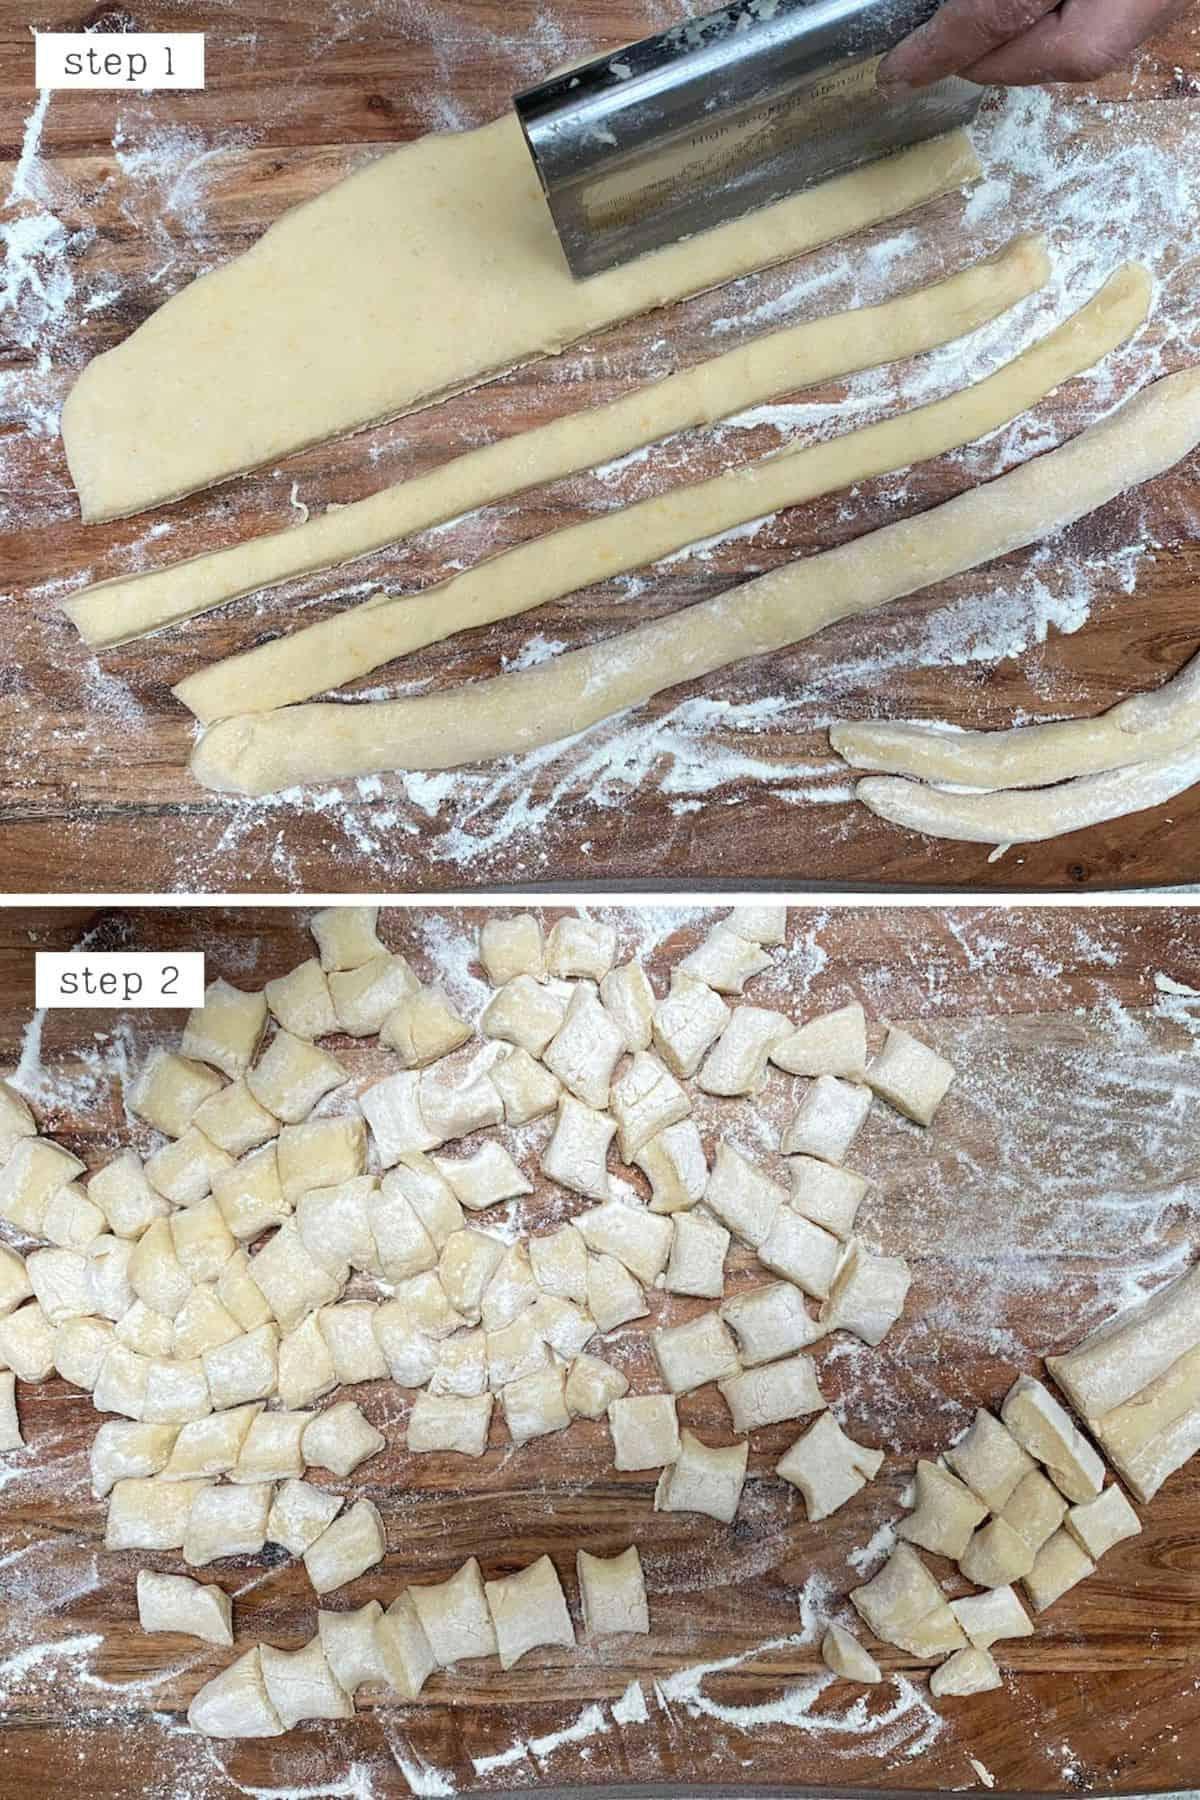 Steps for cutting dough for gnocchi